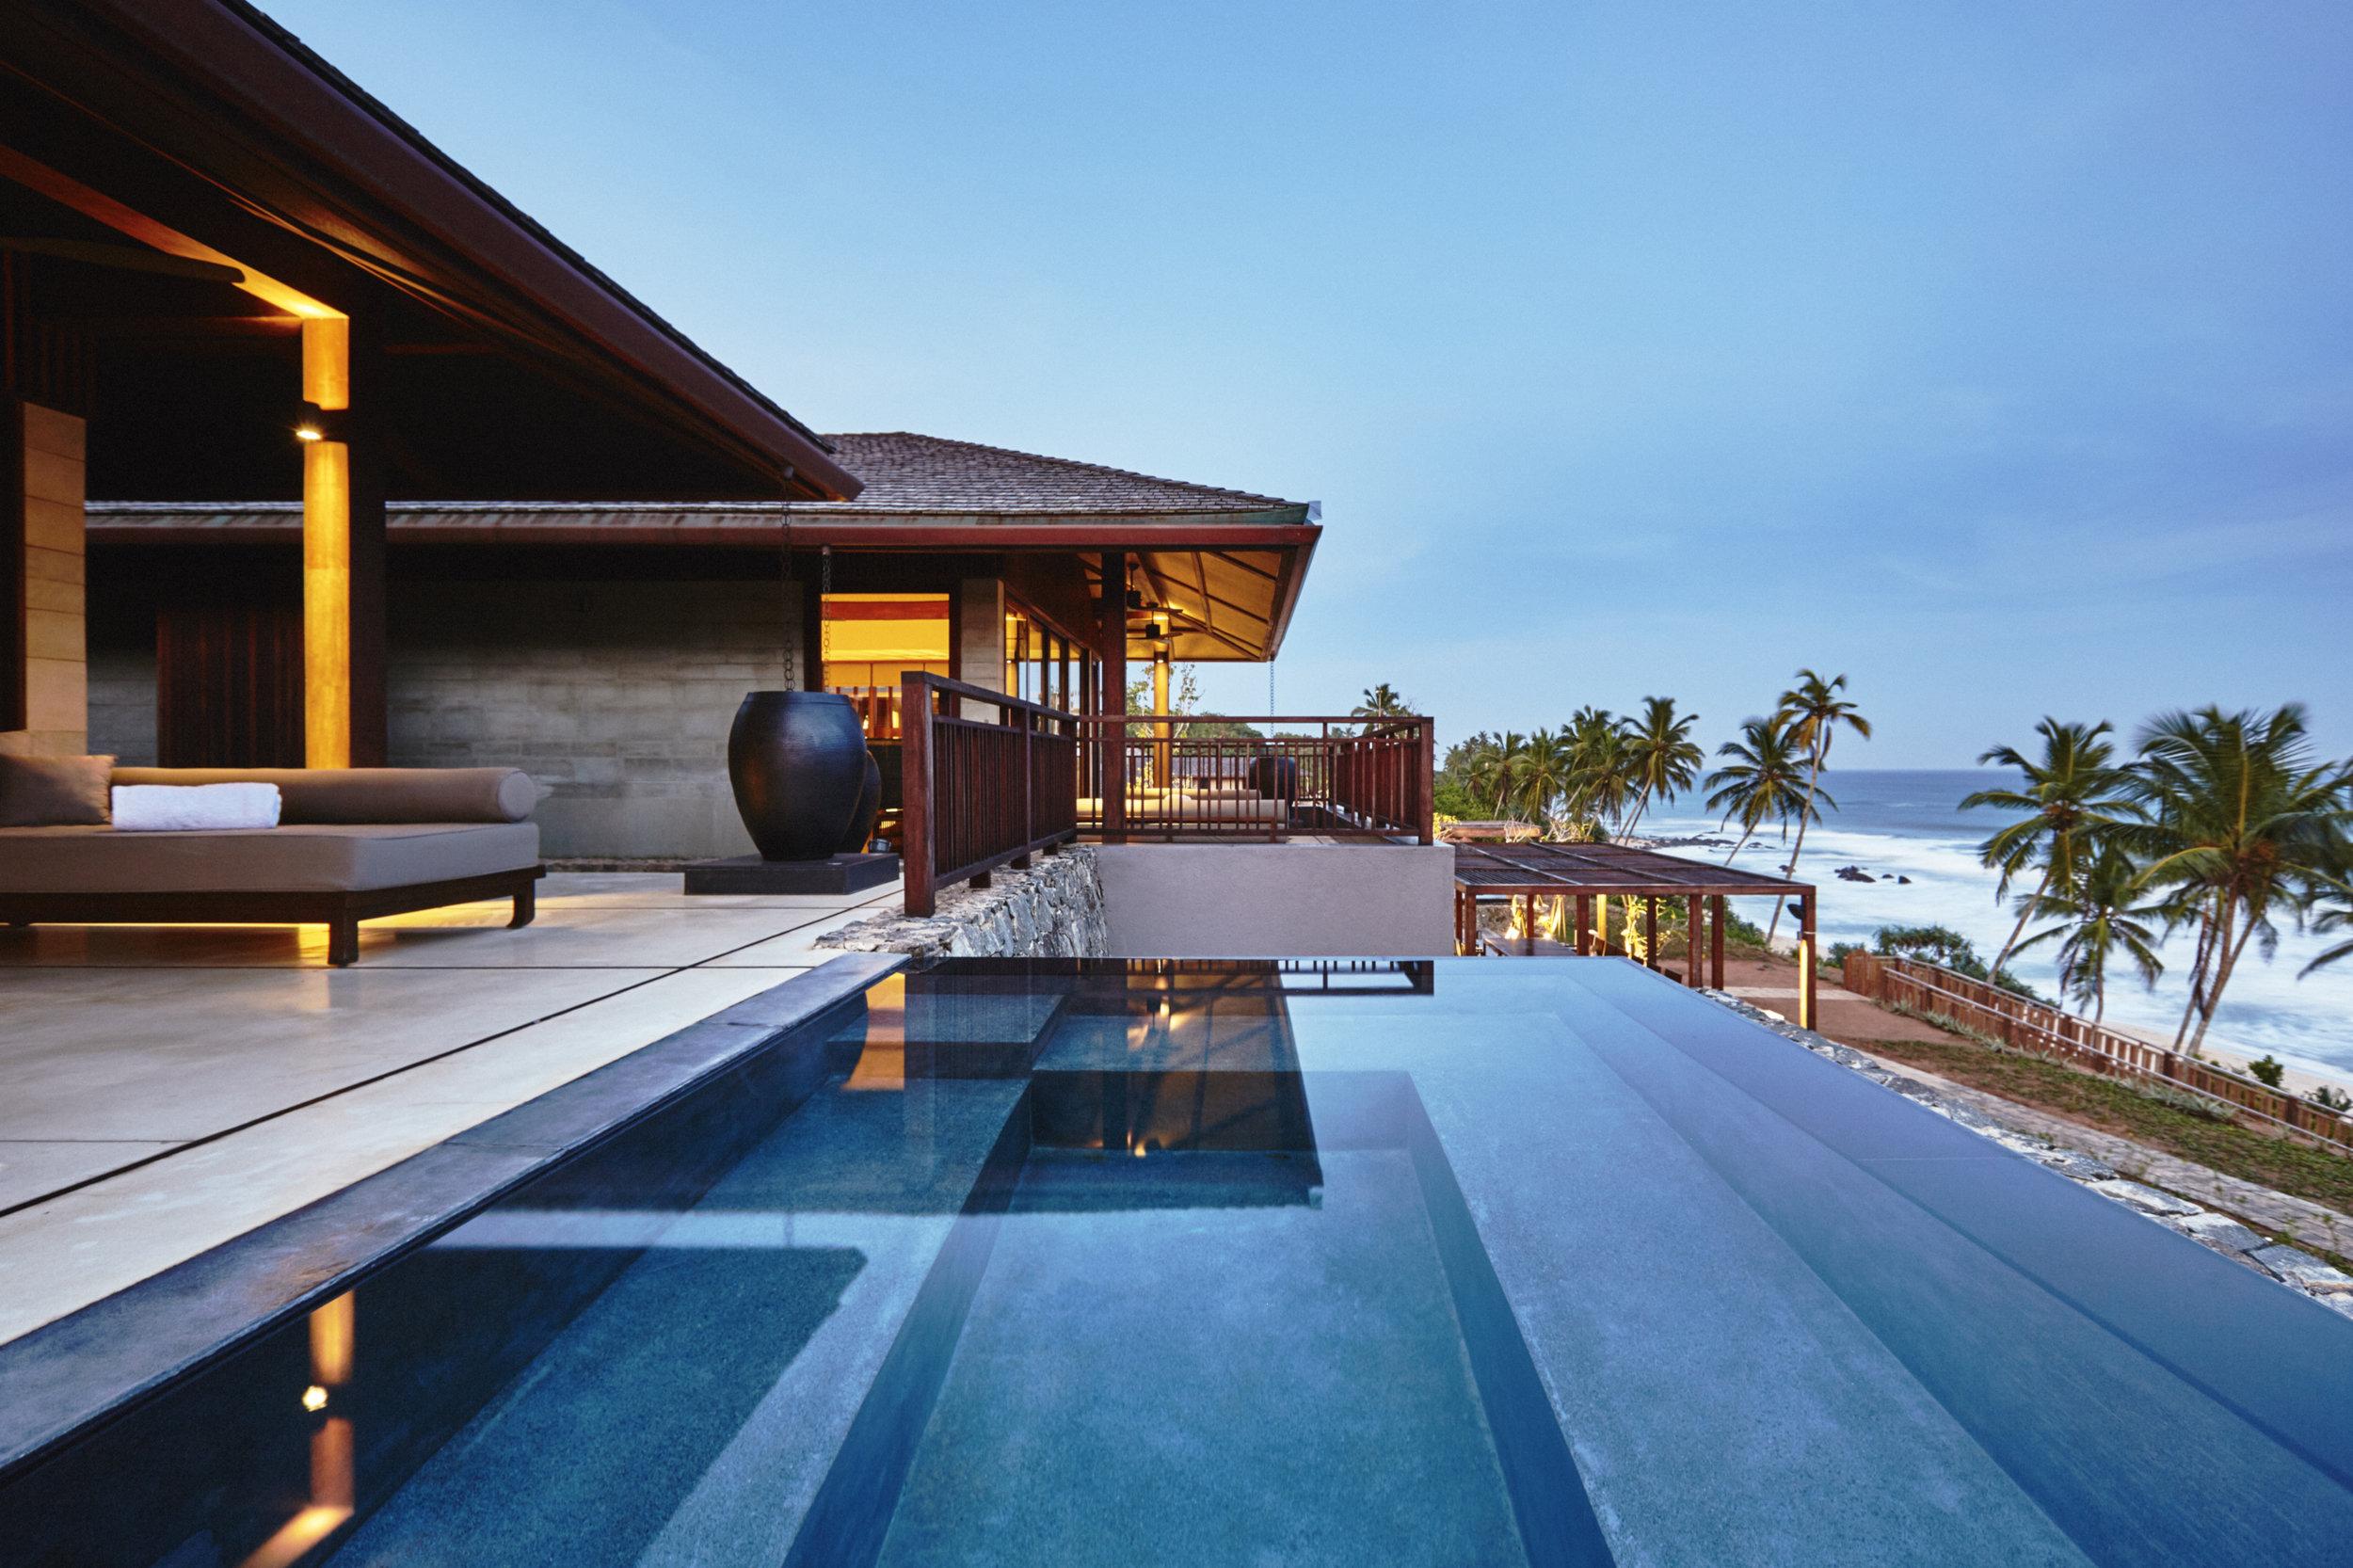 AW²- Sri Lanka - Dickwella - Hôtel + Maison ©Mikael Benard.jpg